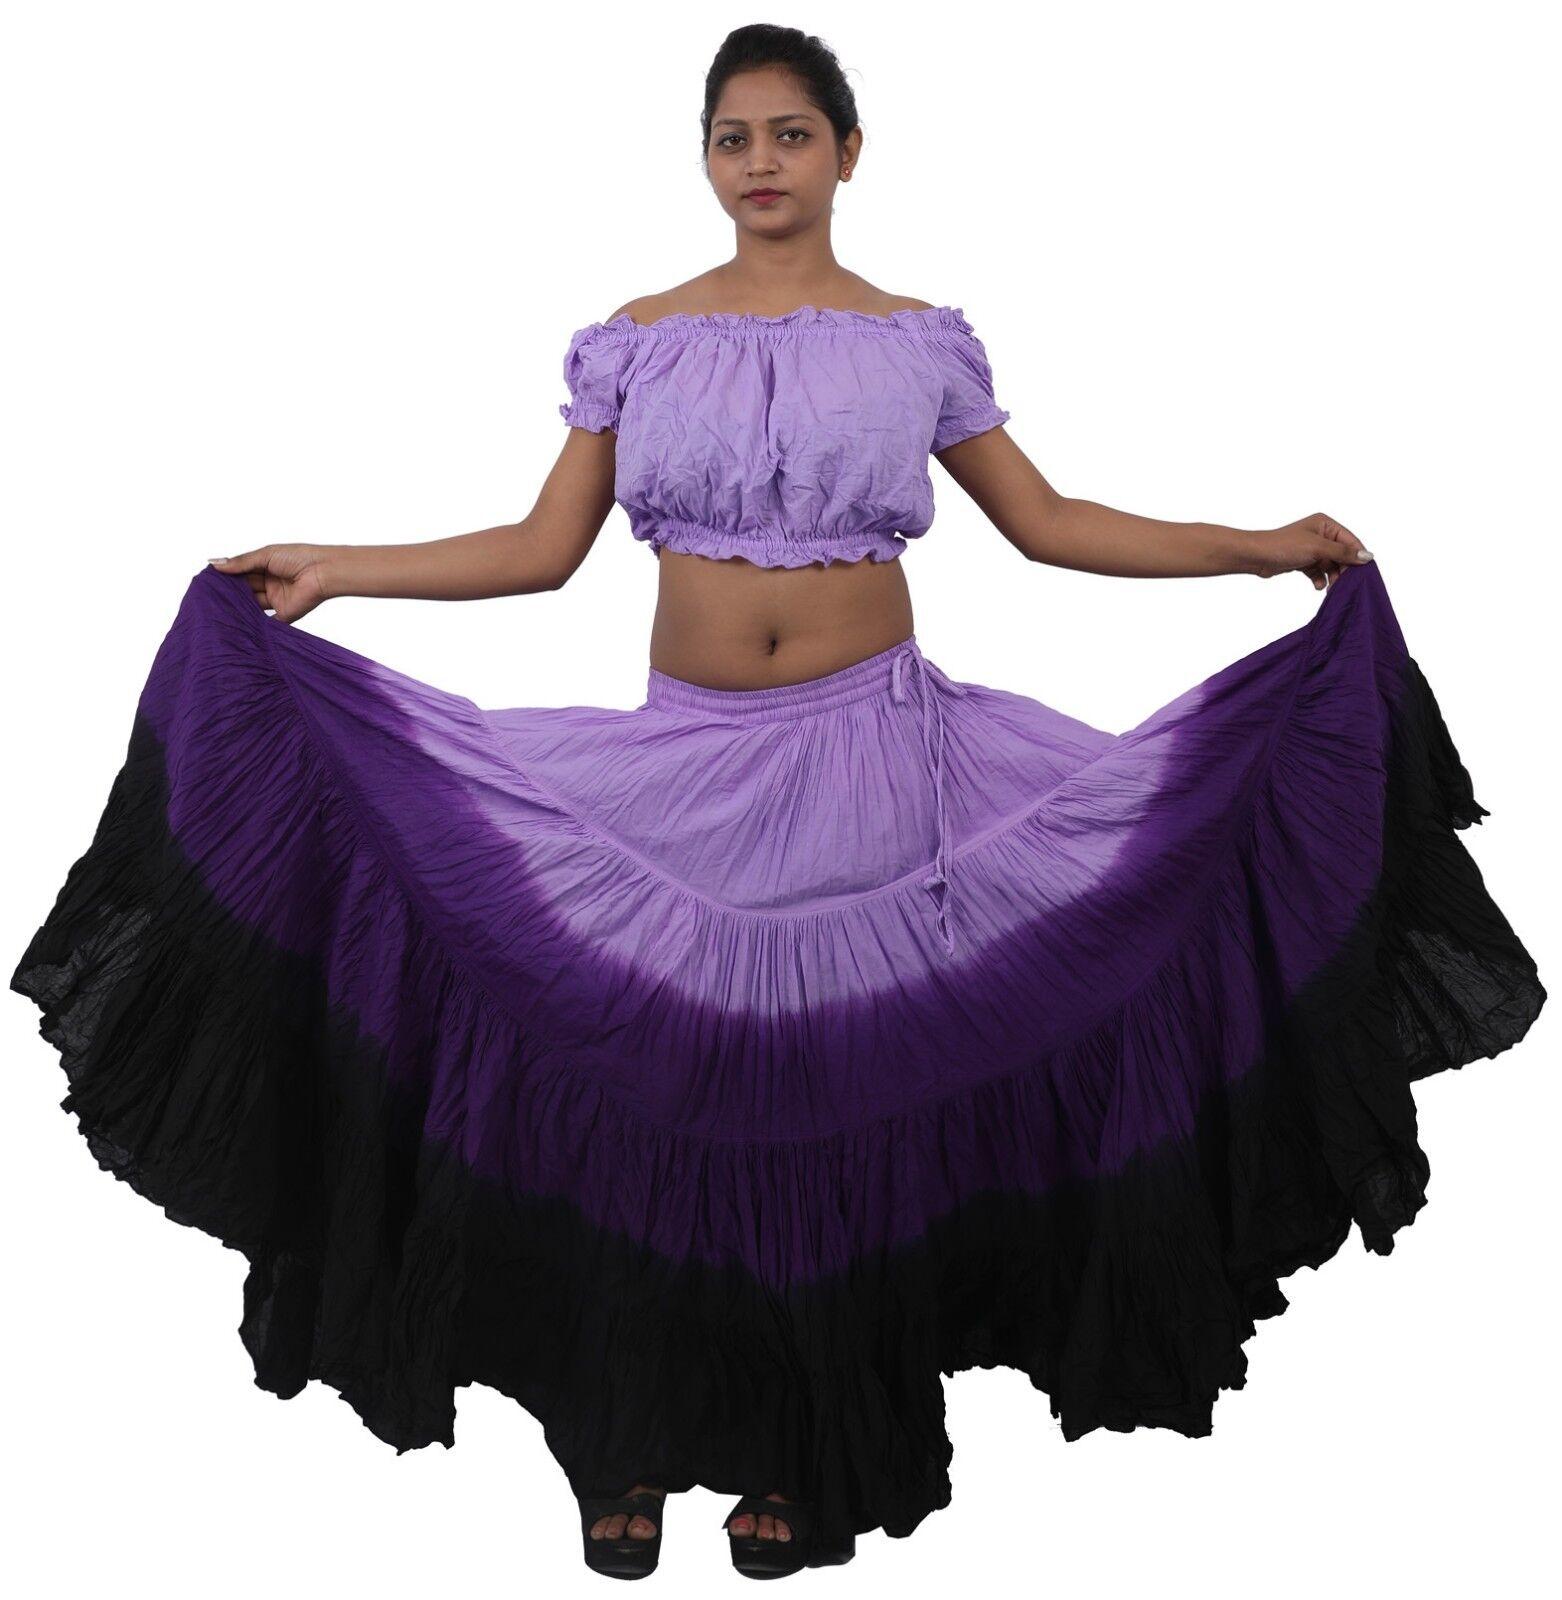 LPB Cotton Belly Dance Tribal Gypsy 4 Tier 25 Yard Skirt Jupe Boho